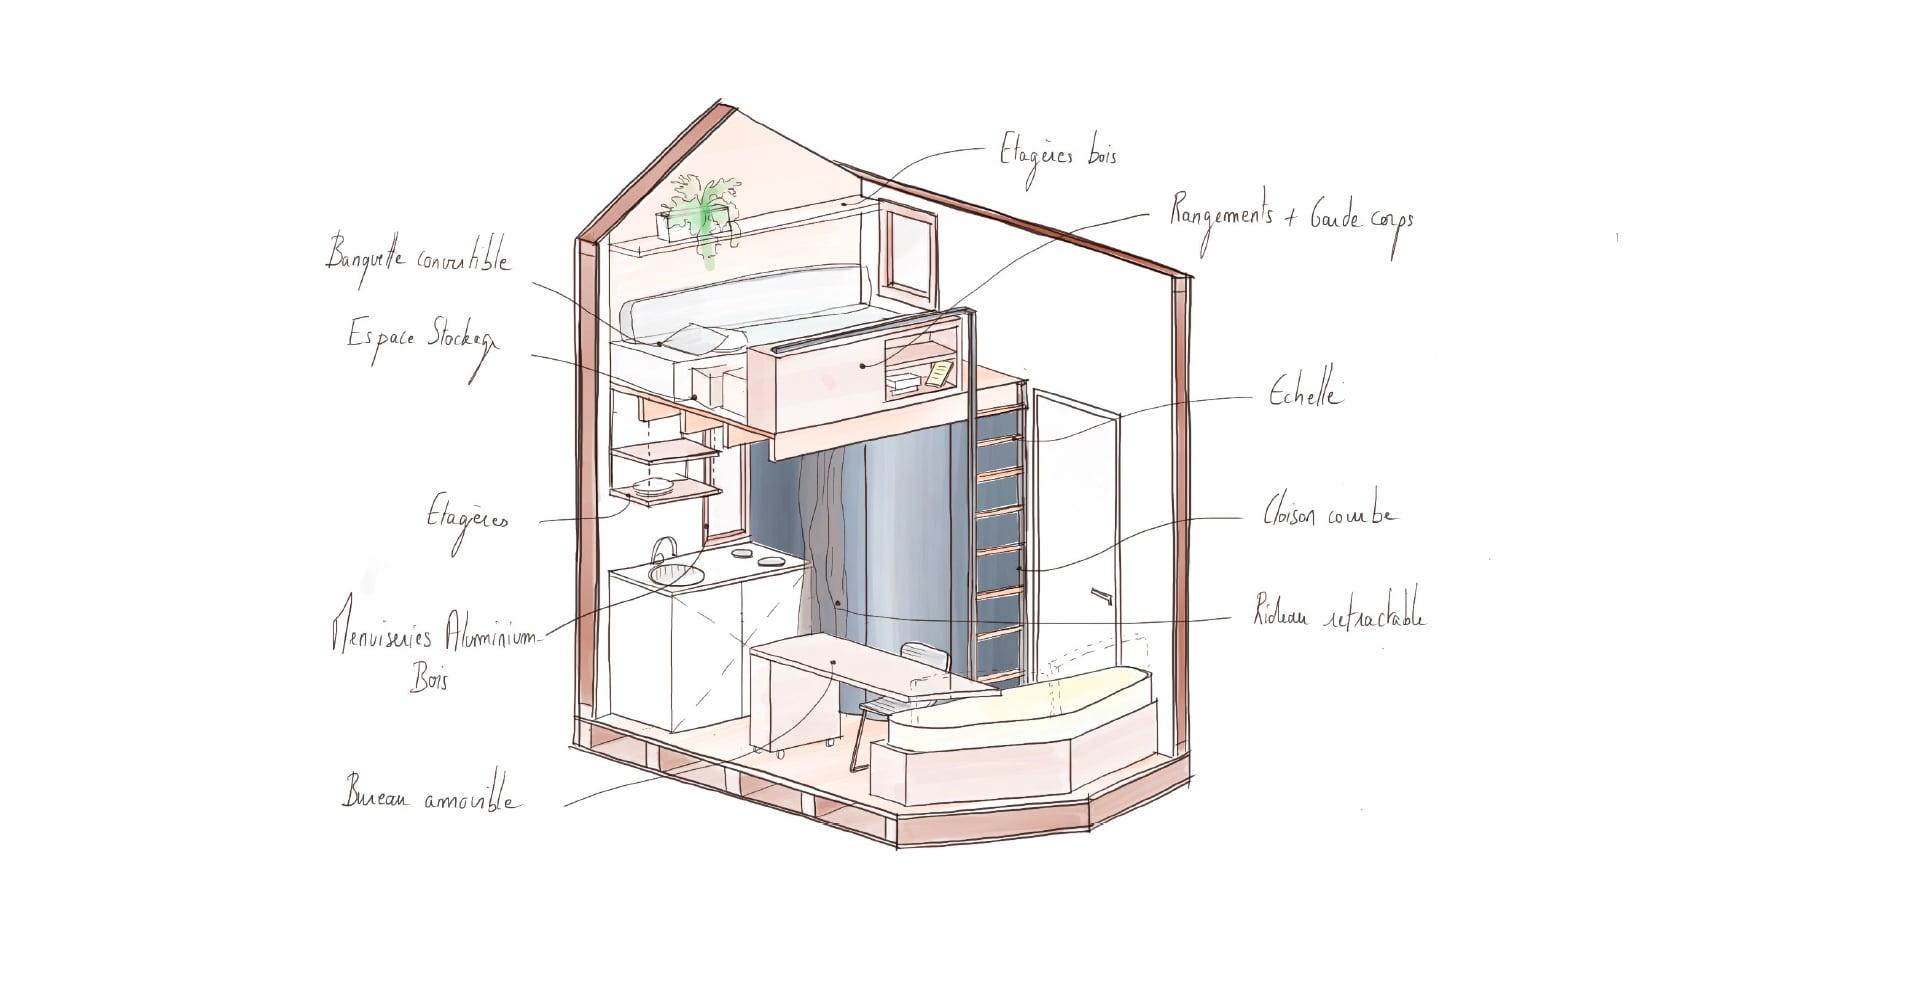 tiny-house-model-office-interieur